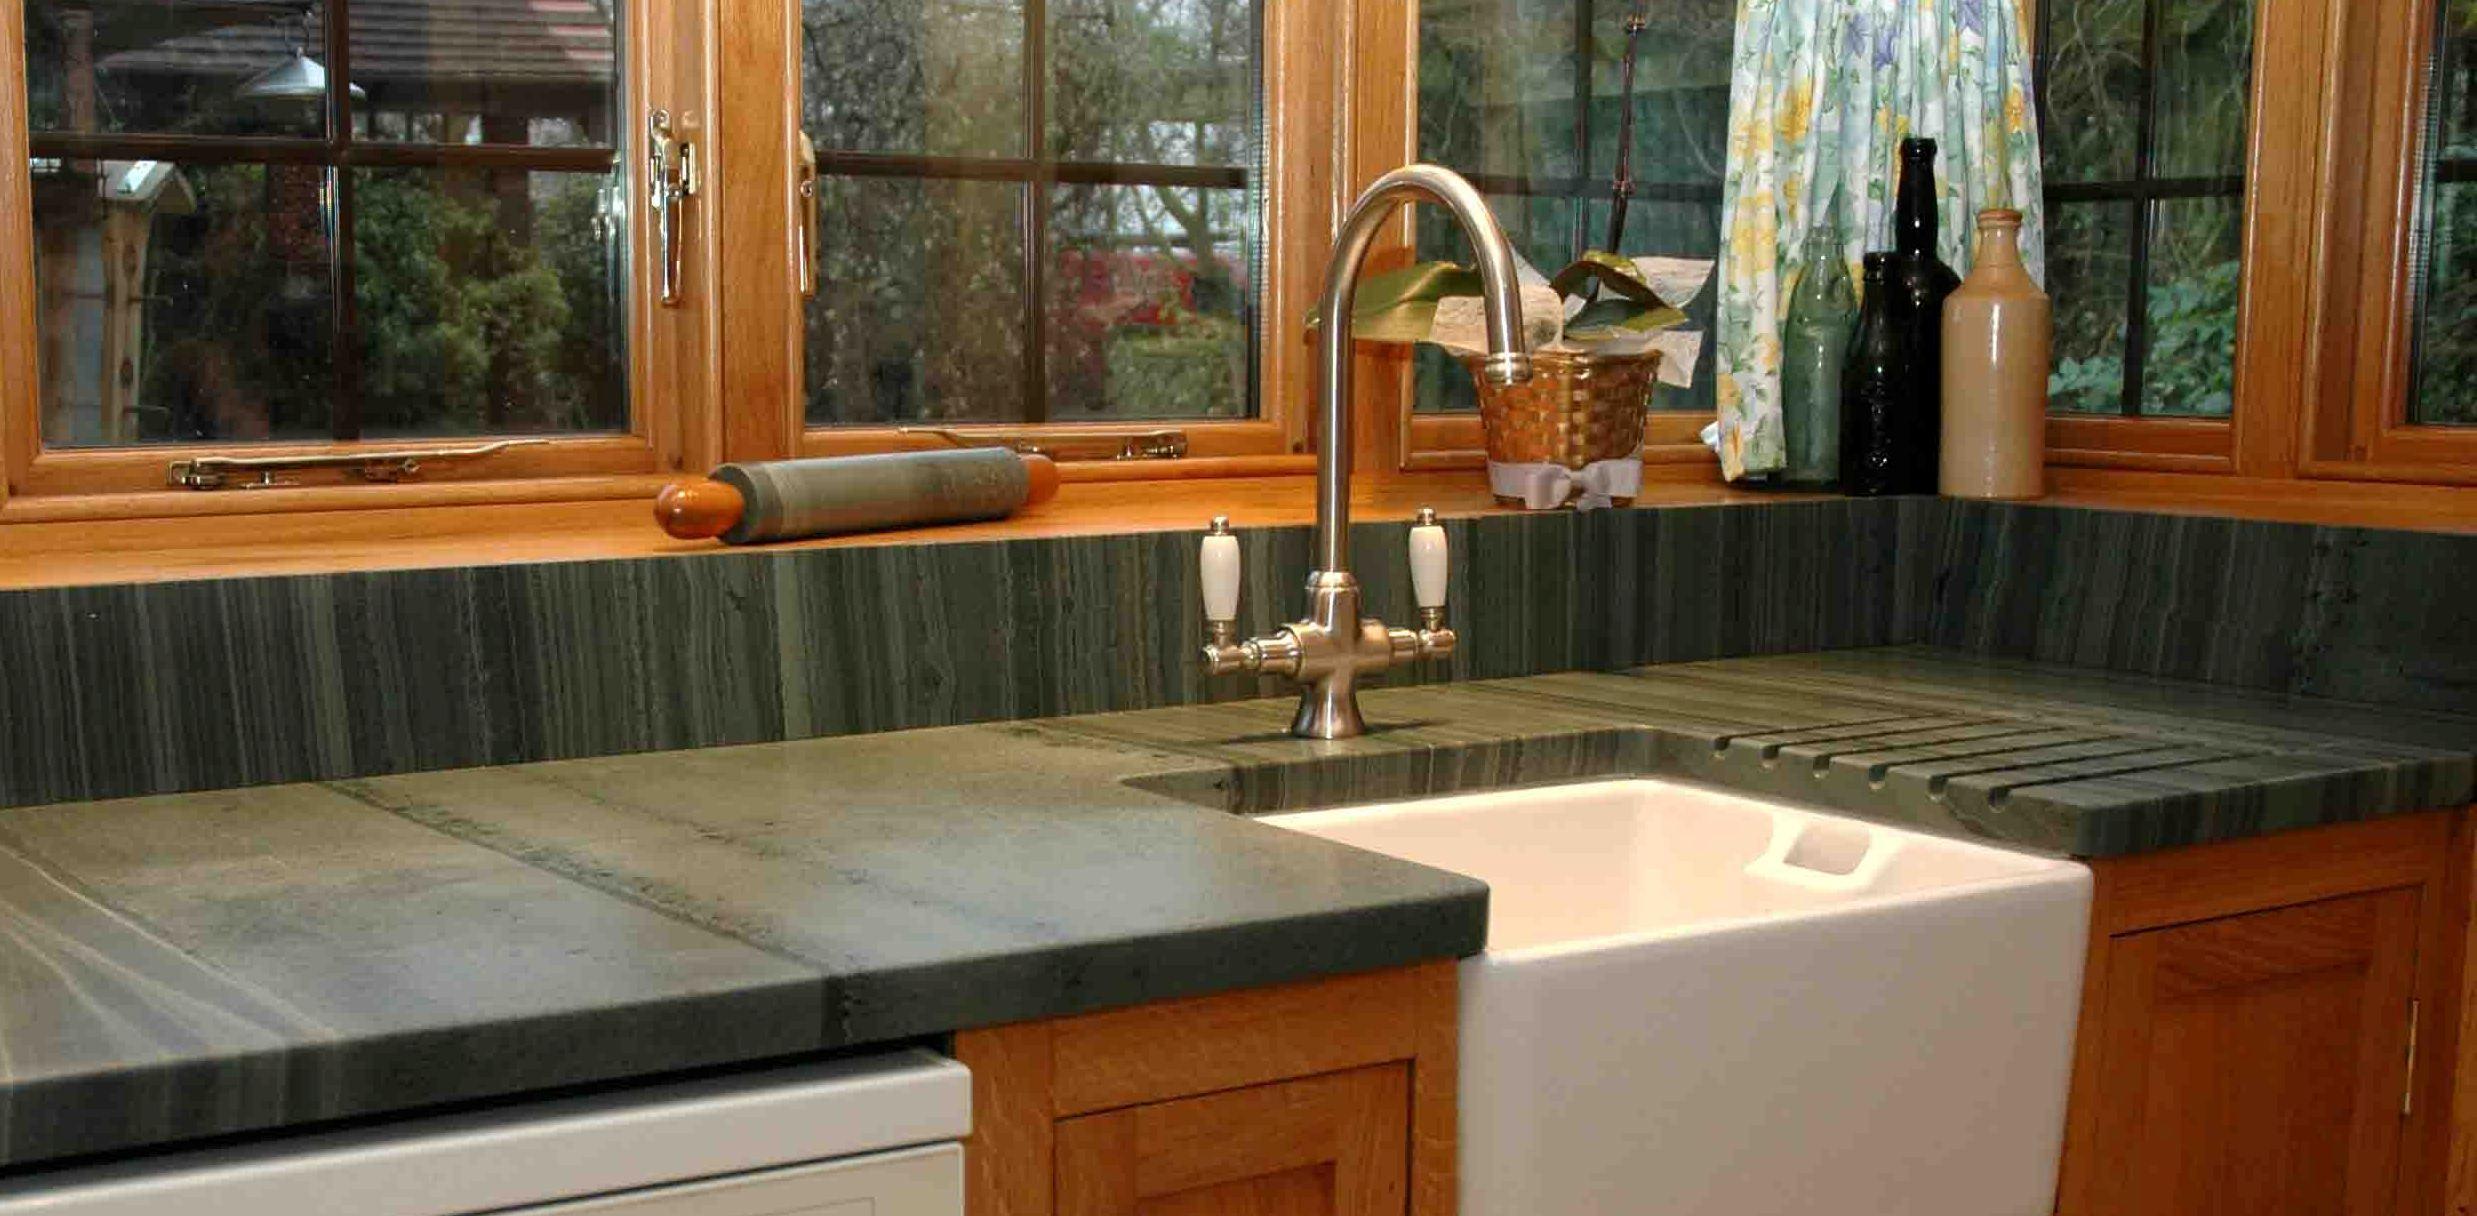 Green Slate Floor Google Search Slate Flooring Pinterest Green And Flooring